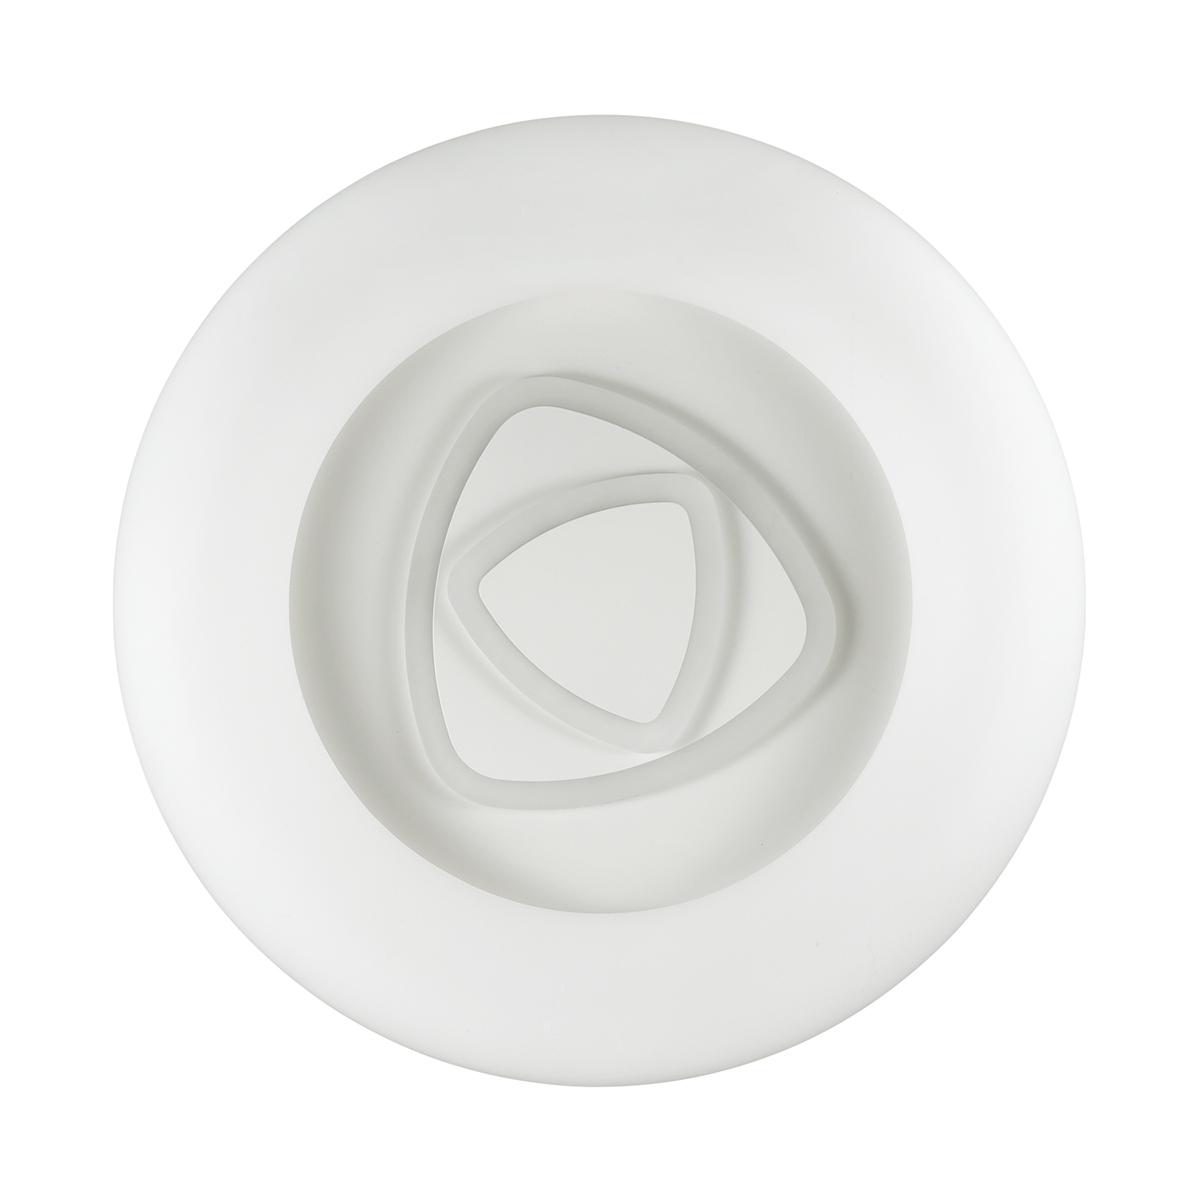 Потолочная люстра Lumion Otto 4419/99CL, белый, металл, пластик - фото 3